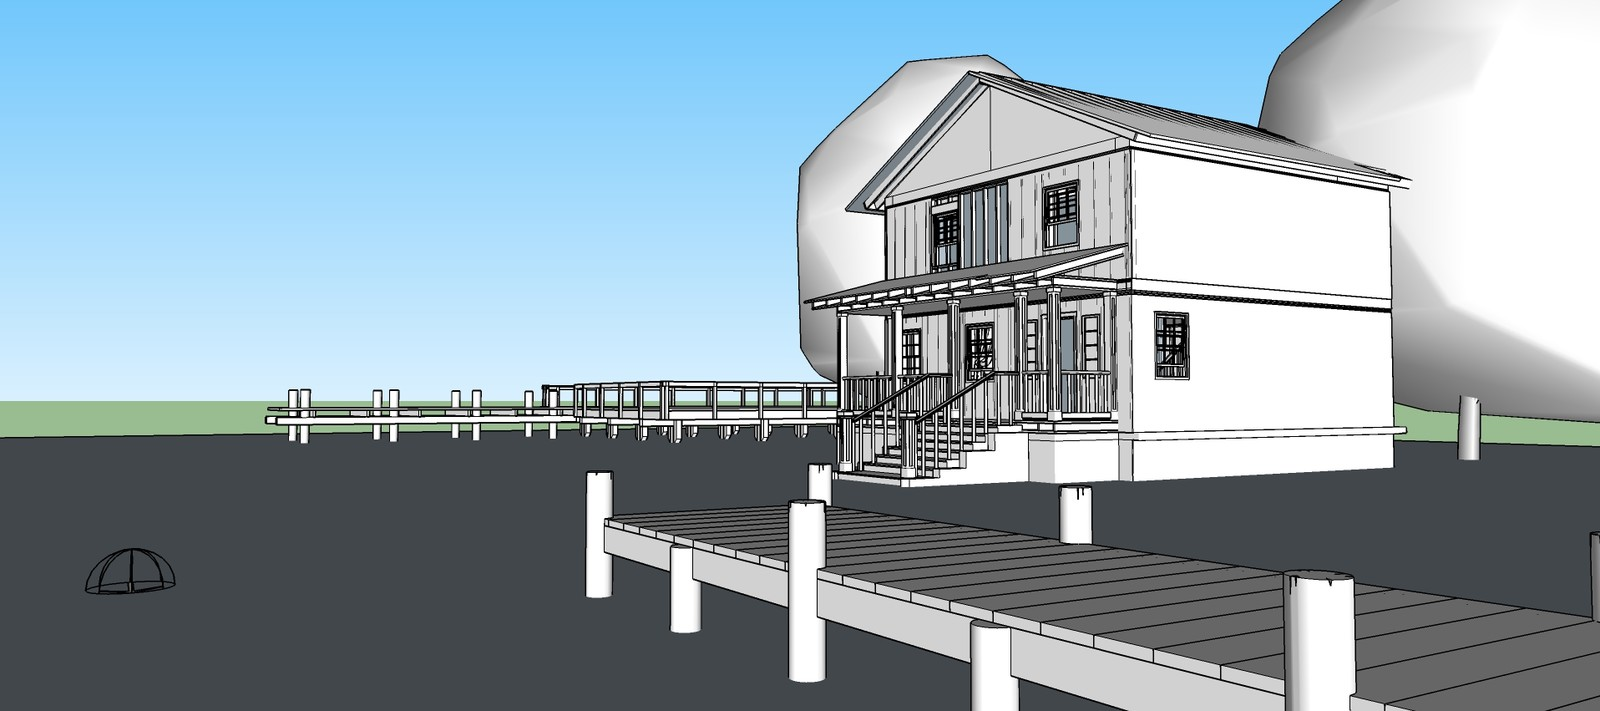 Base render for house exterior